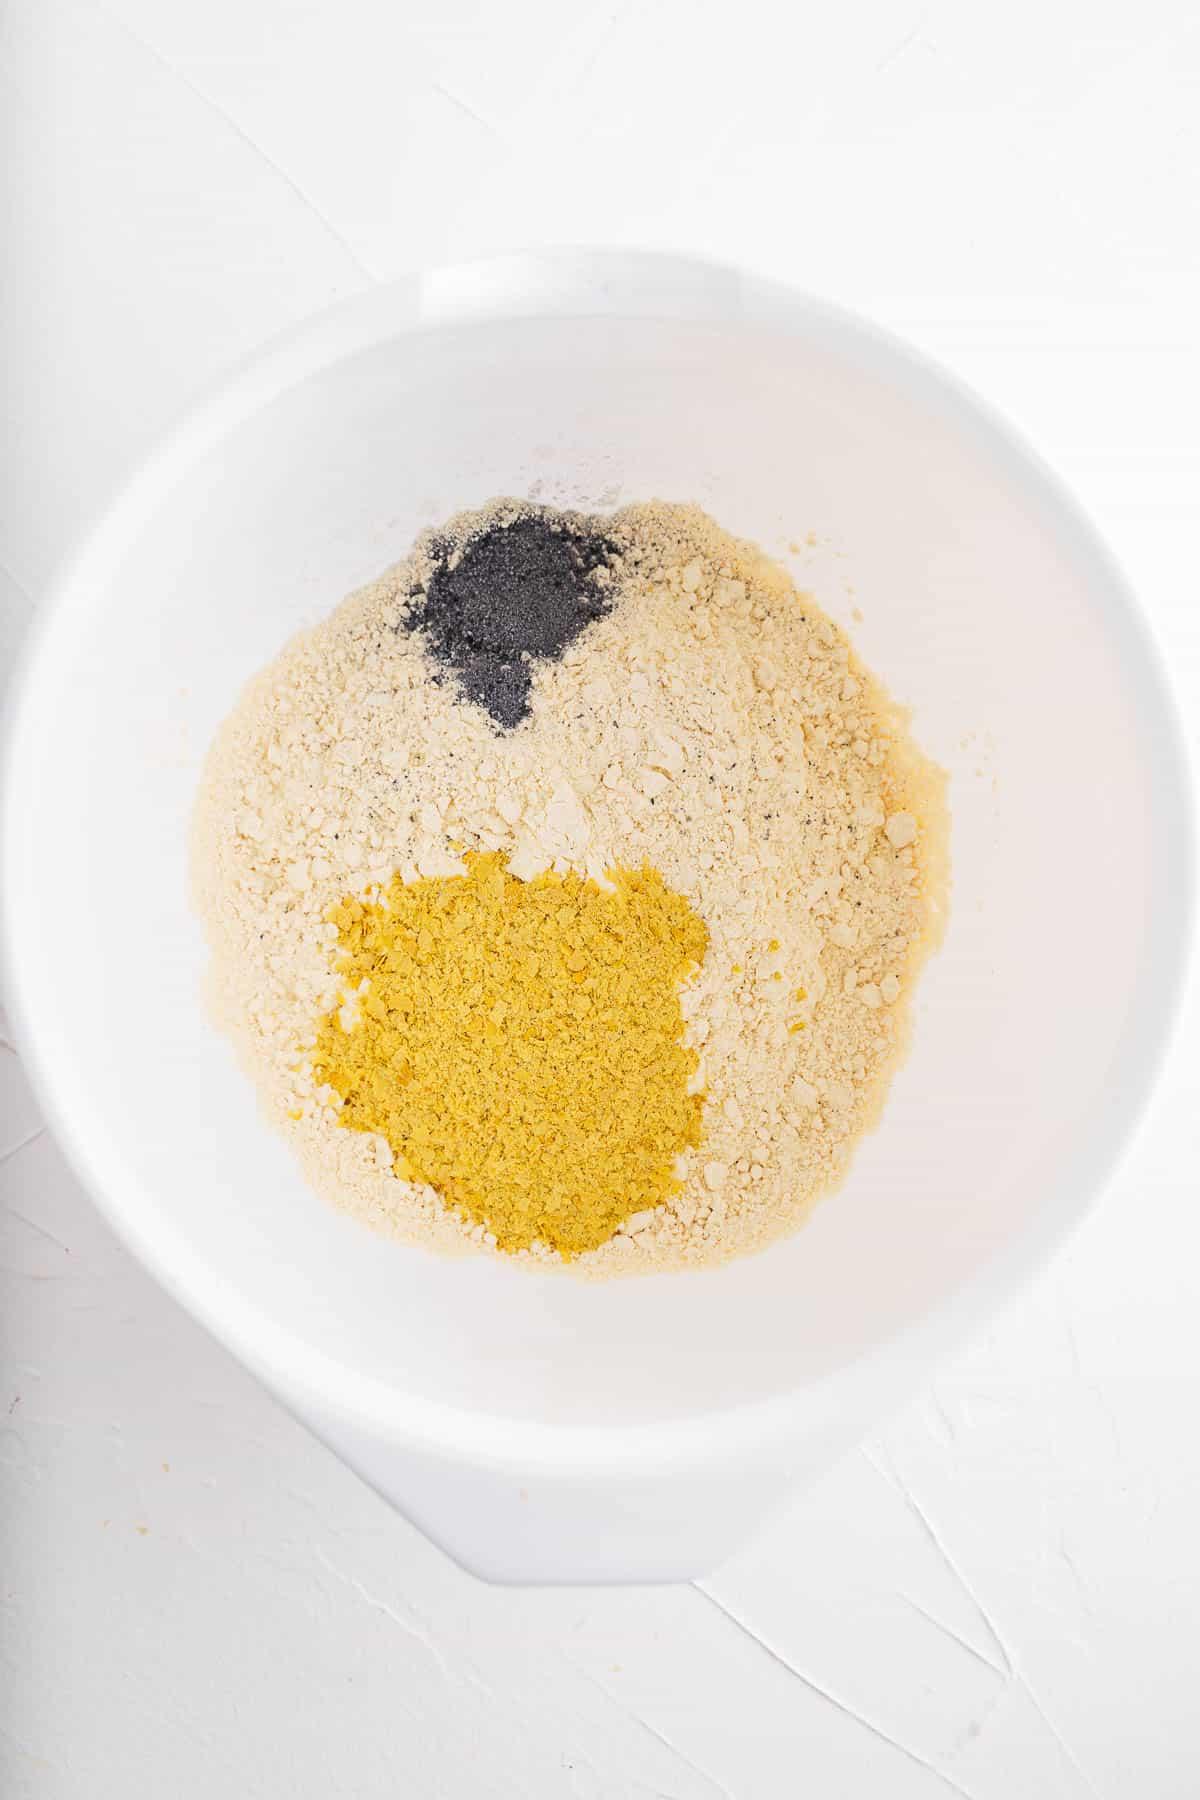 Chickpea Flour, Nutritional Yeast, Black Salt